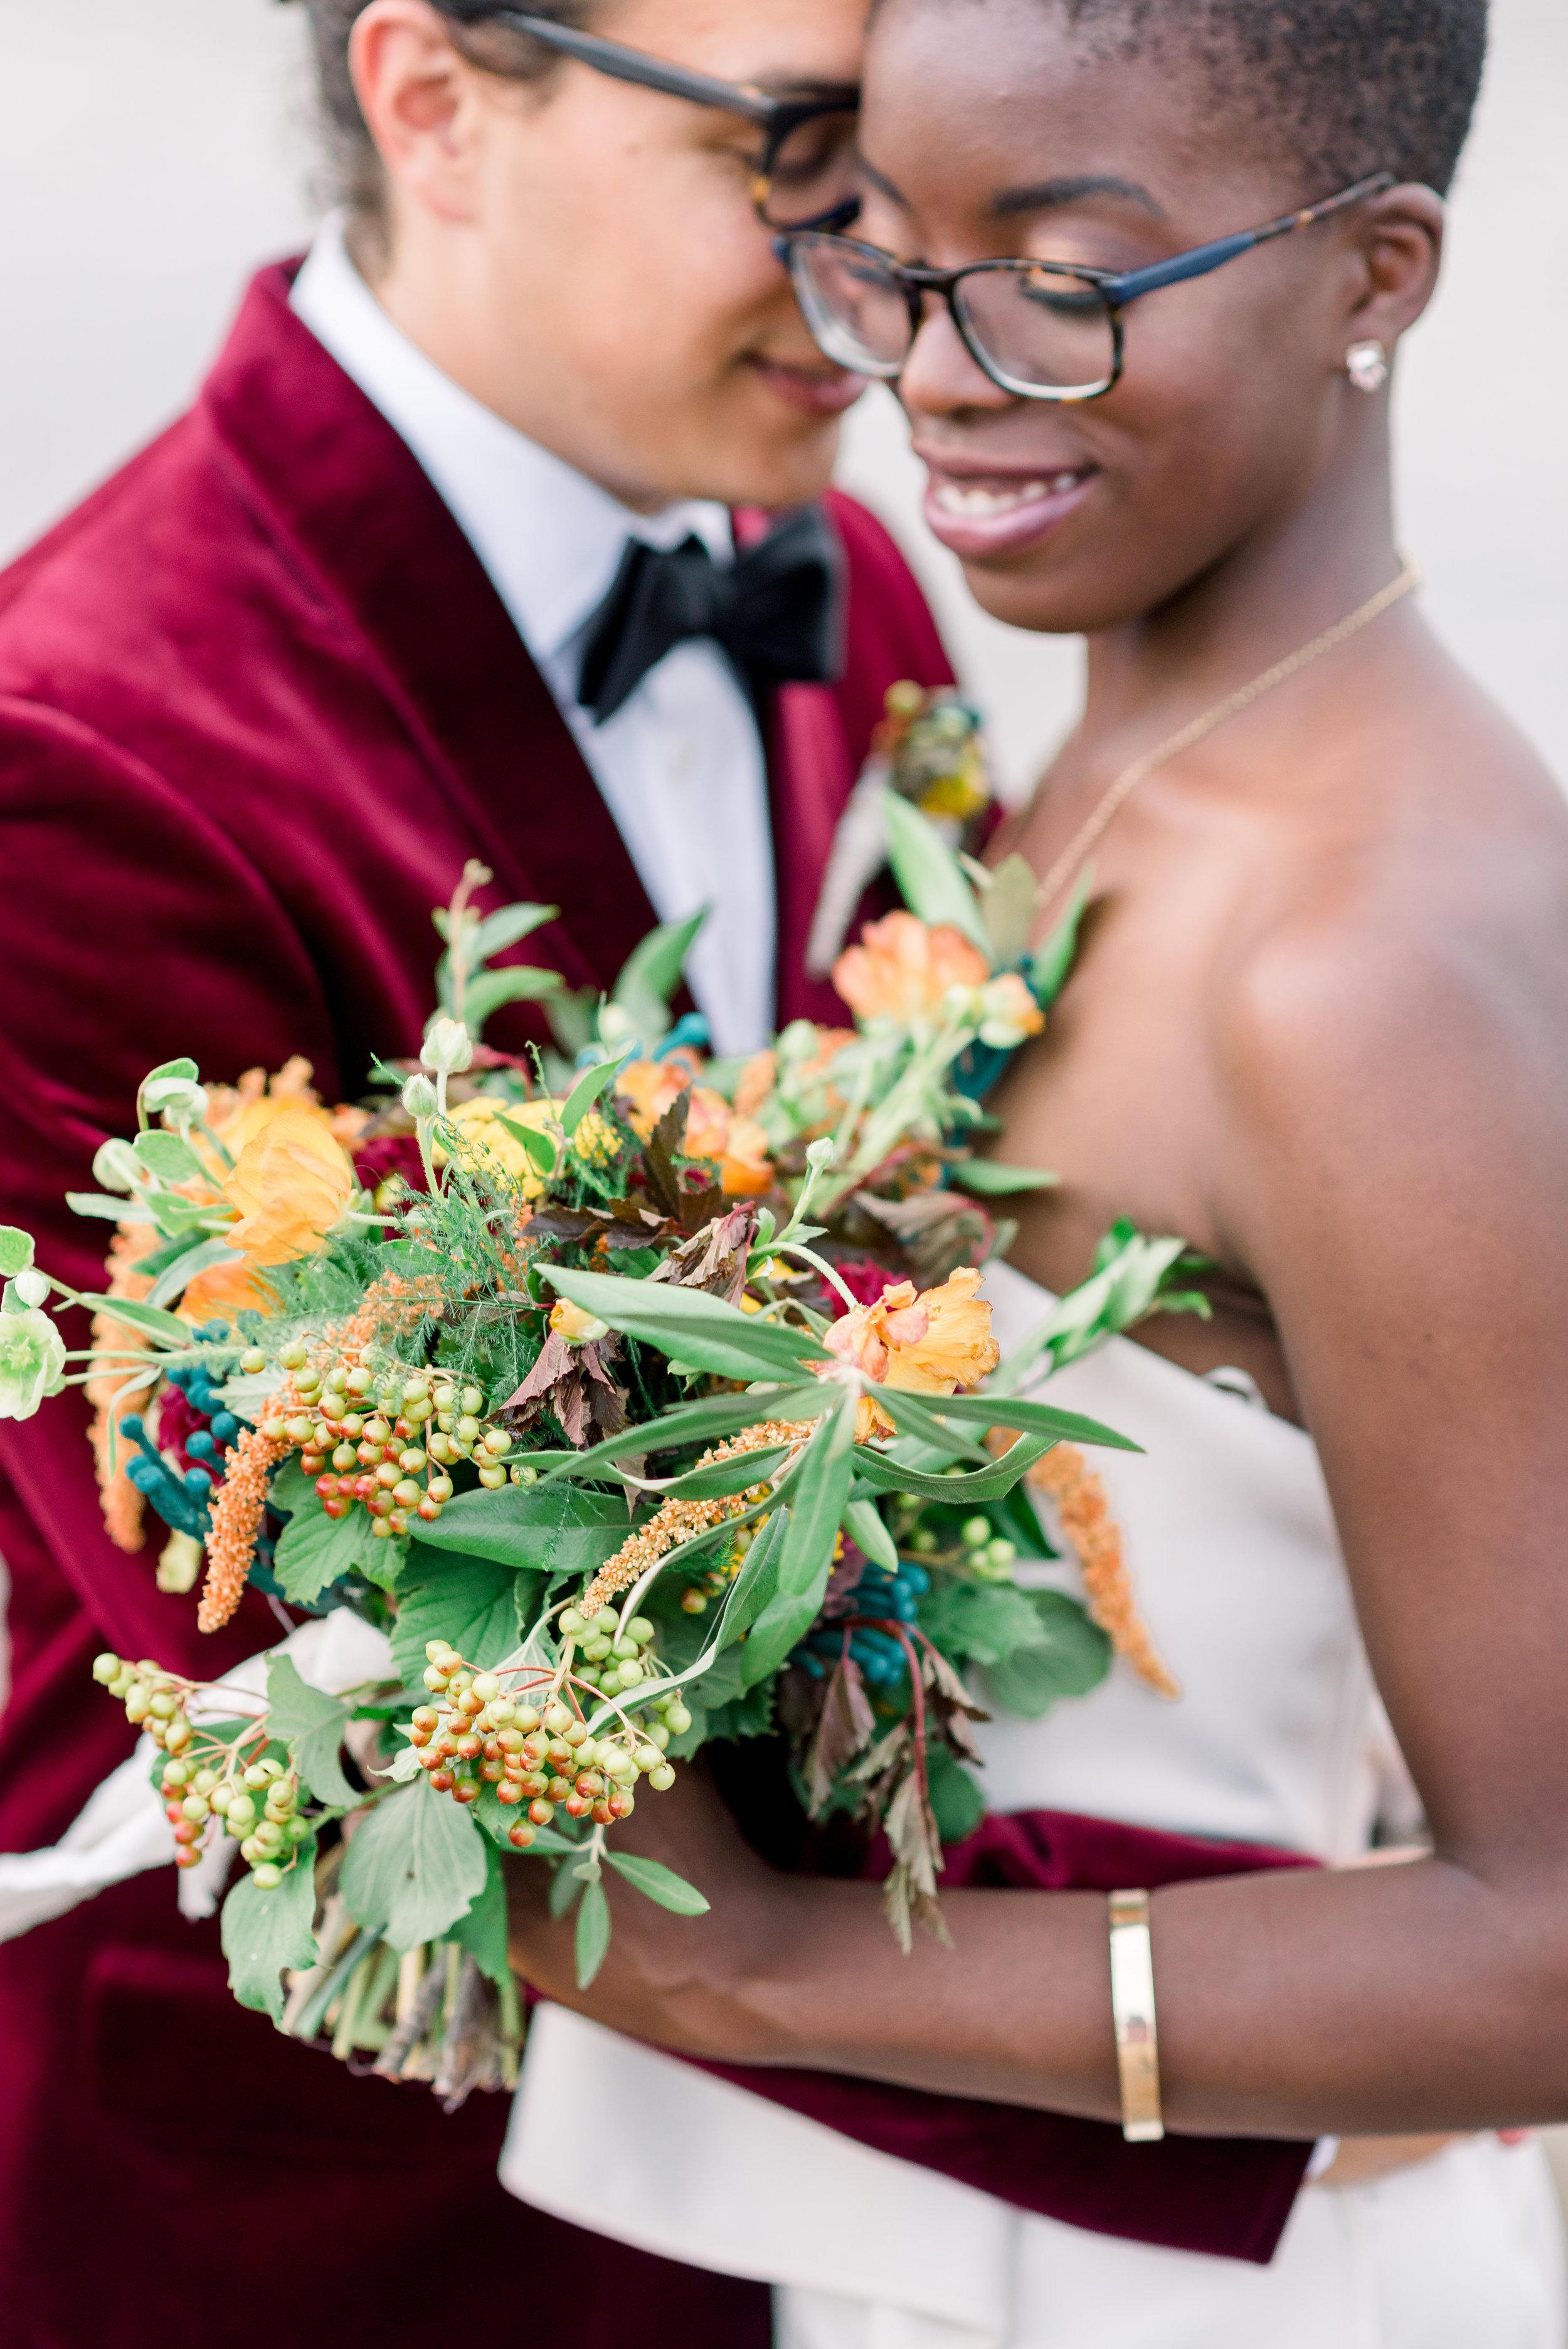 Wood-Violets-Vintage-Brewing-Company-Styled-Shoot-Blu-Moose-Photography-Moji-Jory-Wedding-Photos-22.jpg